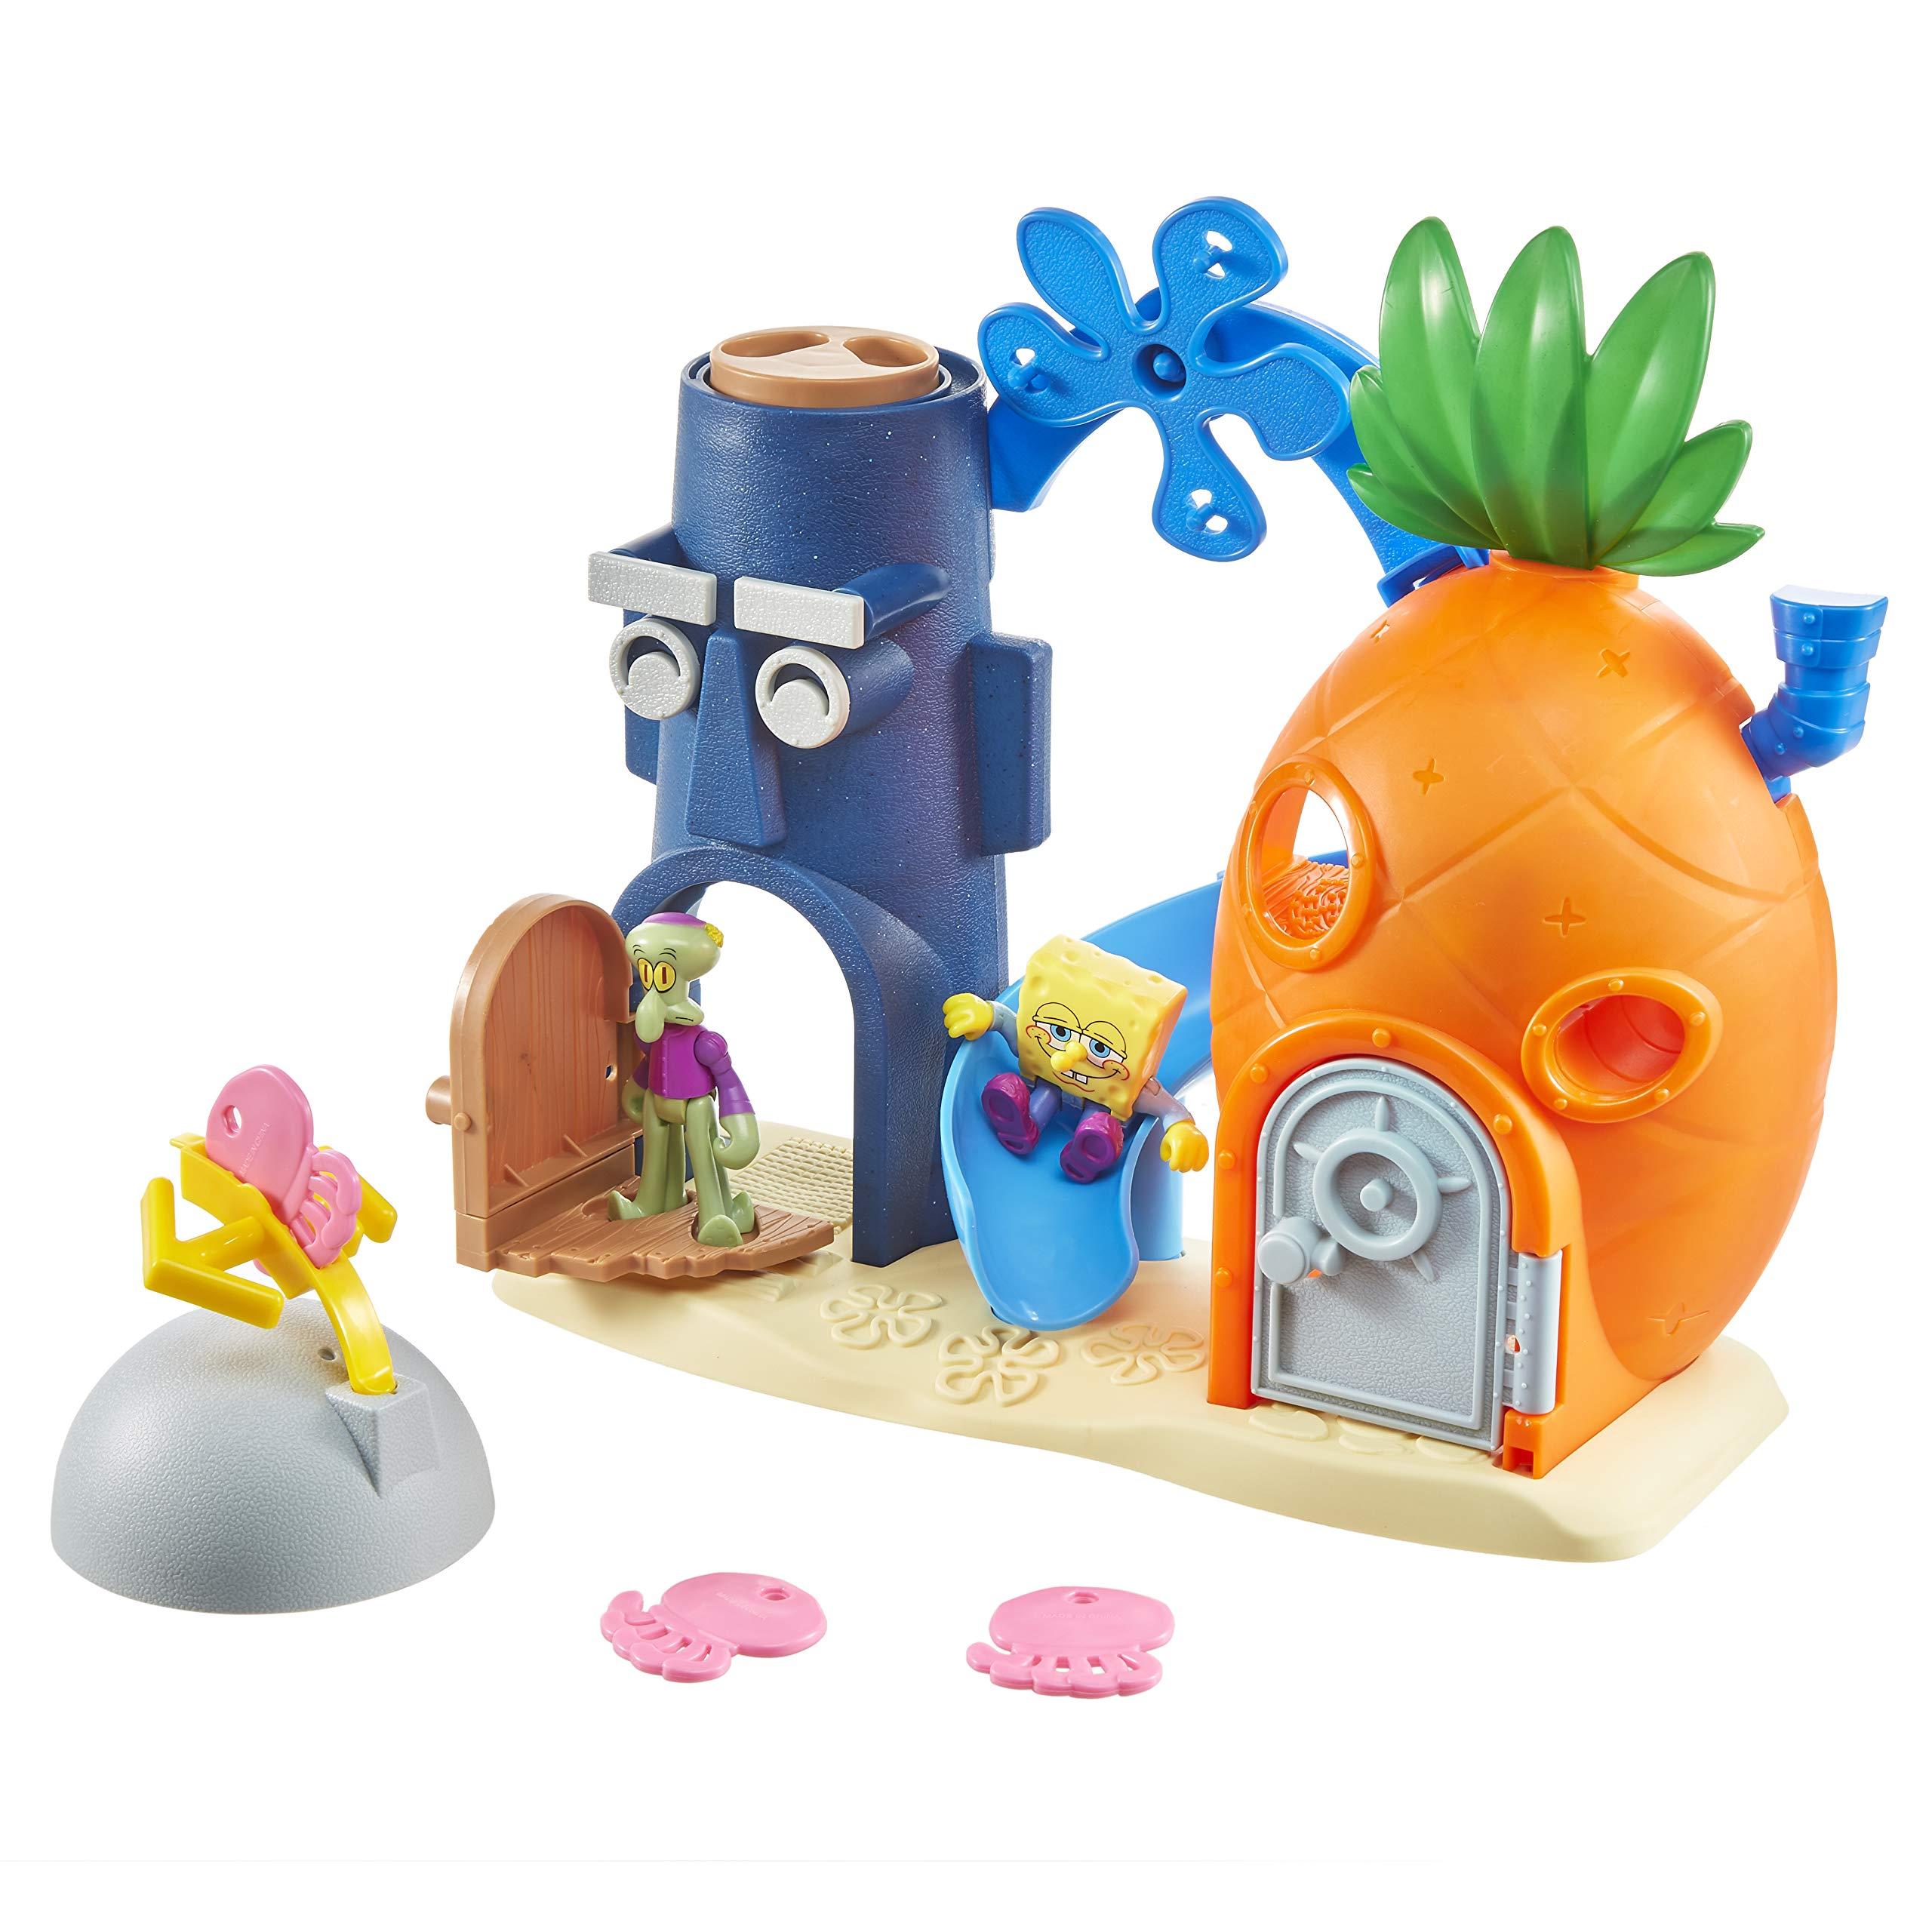 Fisher-Price Imaginext SpongeBob Bikini Bottom Playset, Preschool Toy for Kids 3 Years and Up [Amazon Exclusive]